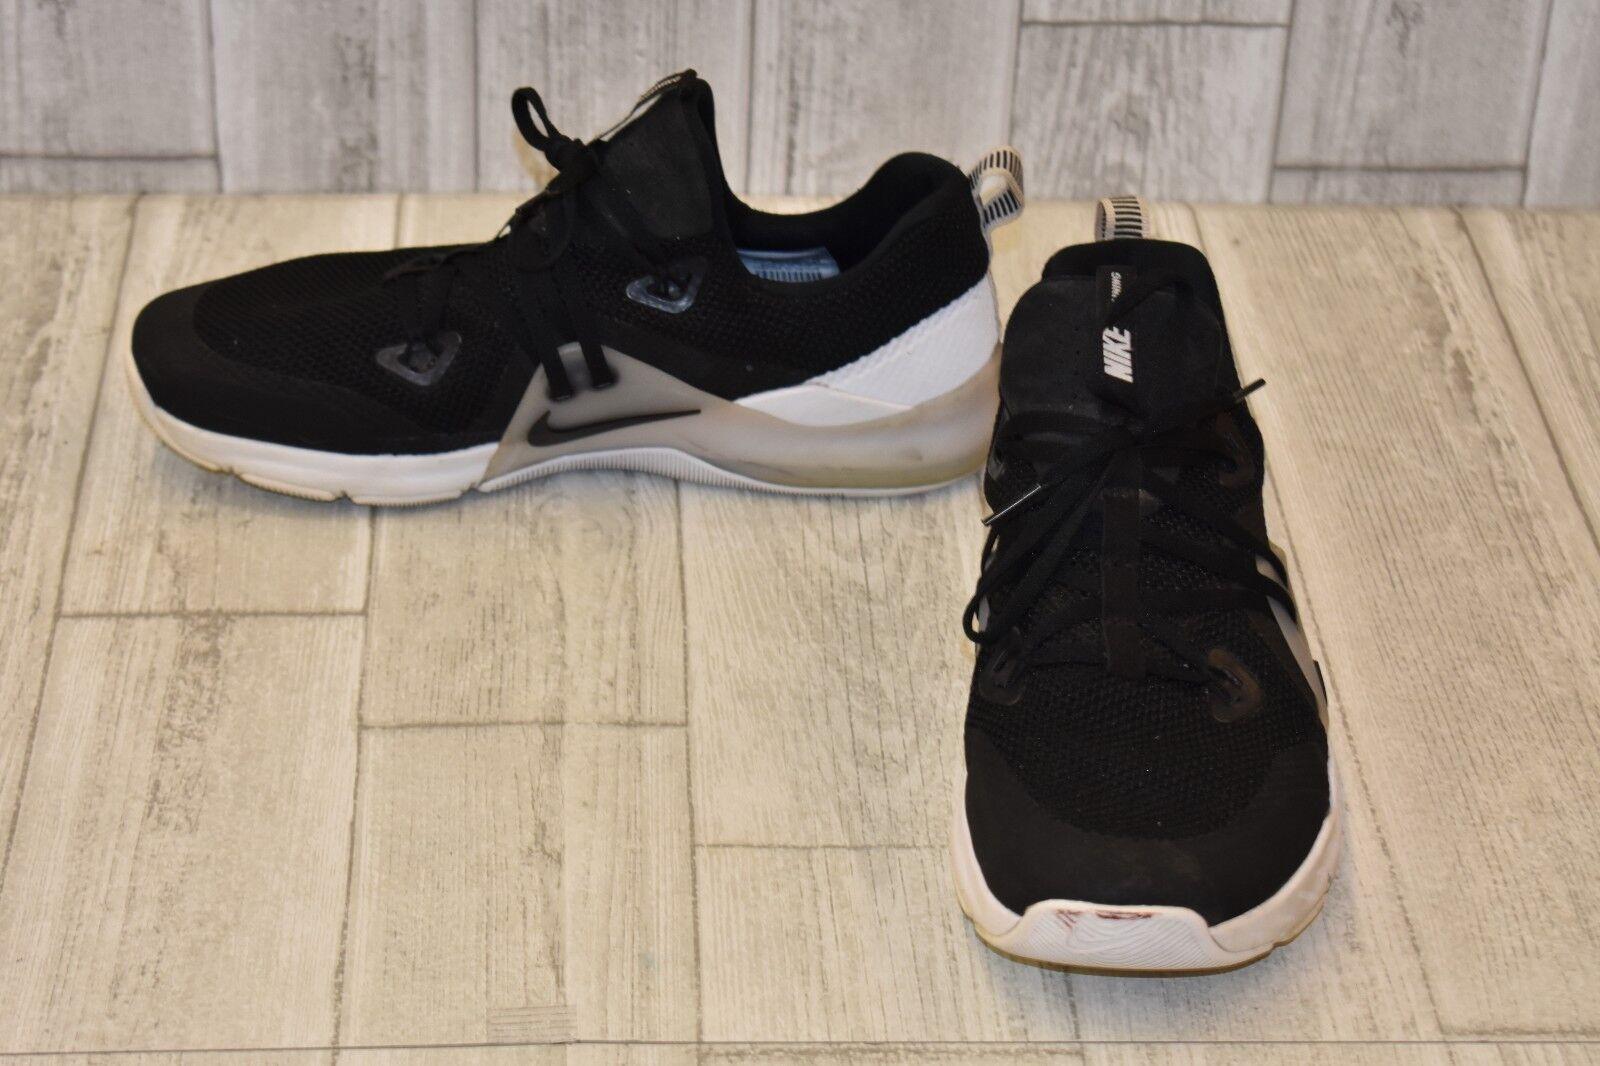 543ec80ca276 Nike Zoom Zoom Zoom Train Command Cross Training Shoes - Men s Size ...